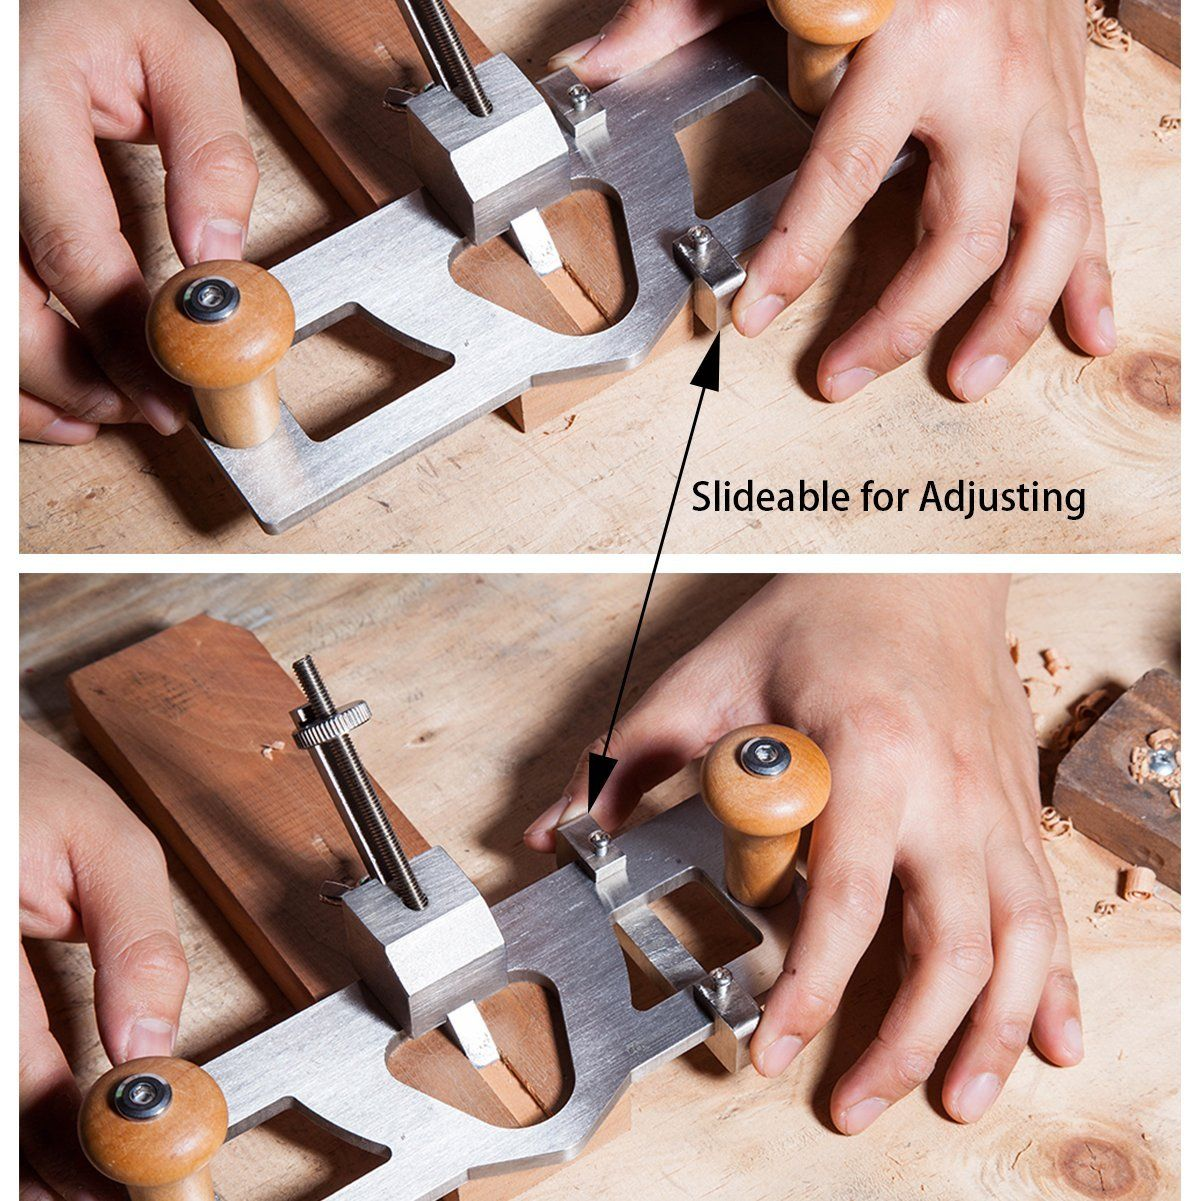 Cowryman Router Plane Handheld Woodworking Tool R022 Plane